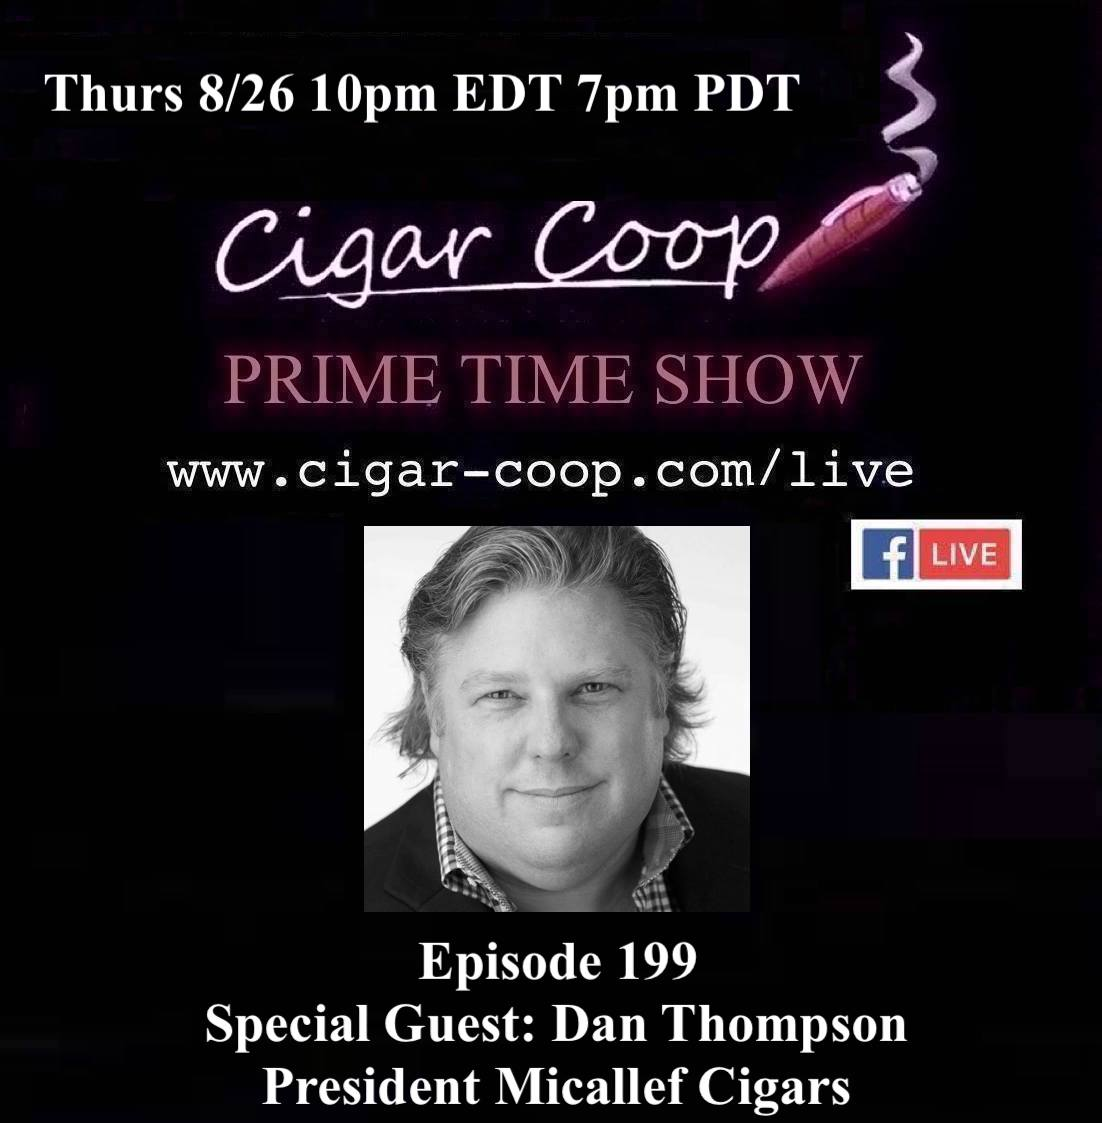 Announcement: Prime Time Episode 199 – Dan Thompson, Micallef Cigars